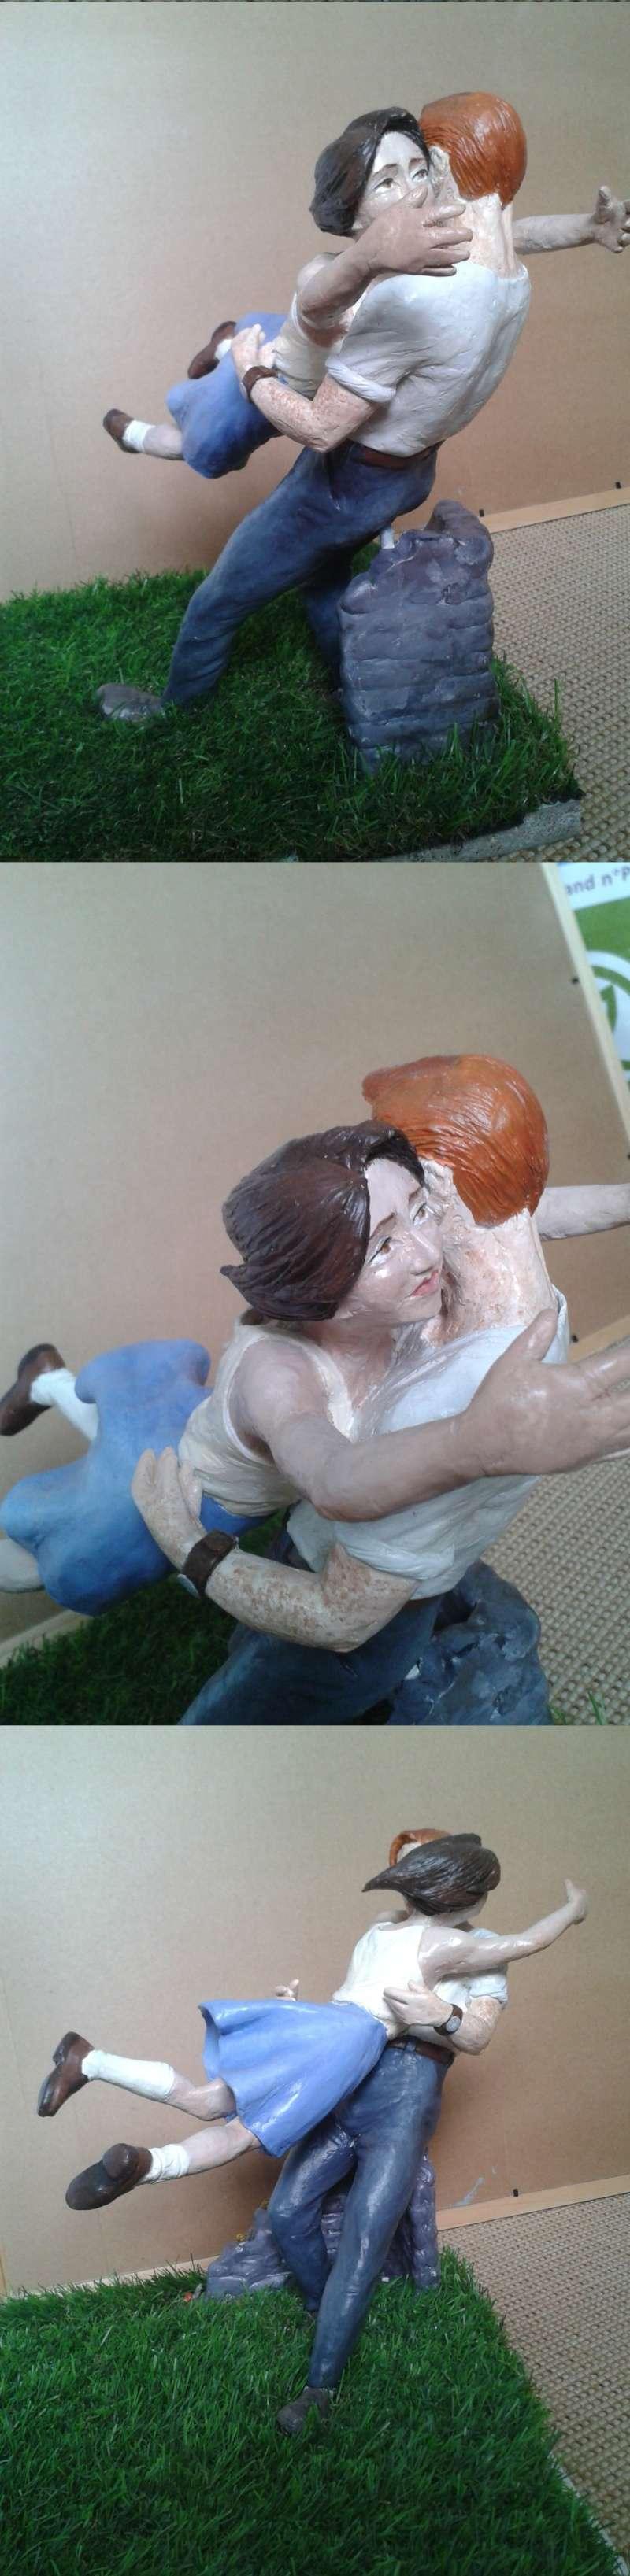 Retrouvailles - sculpture Volume16